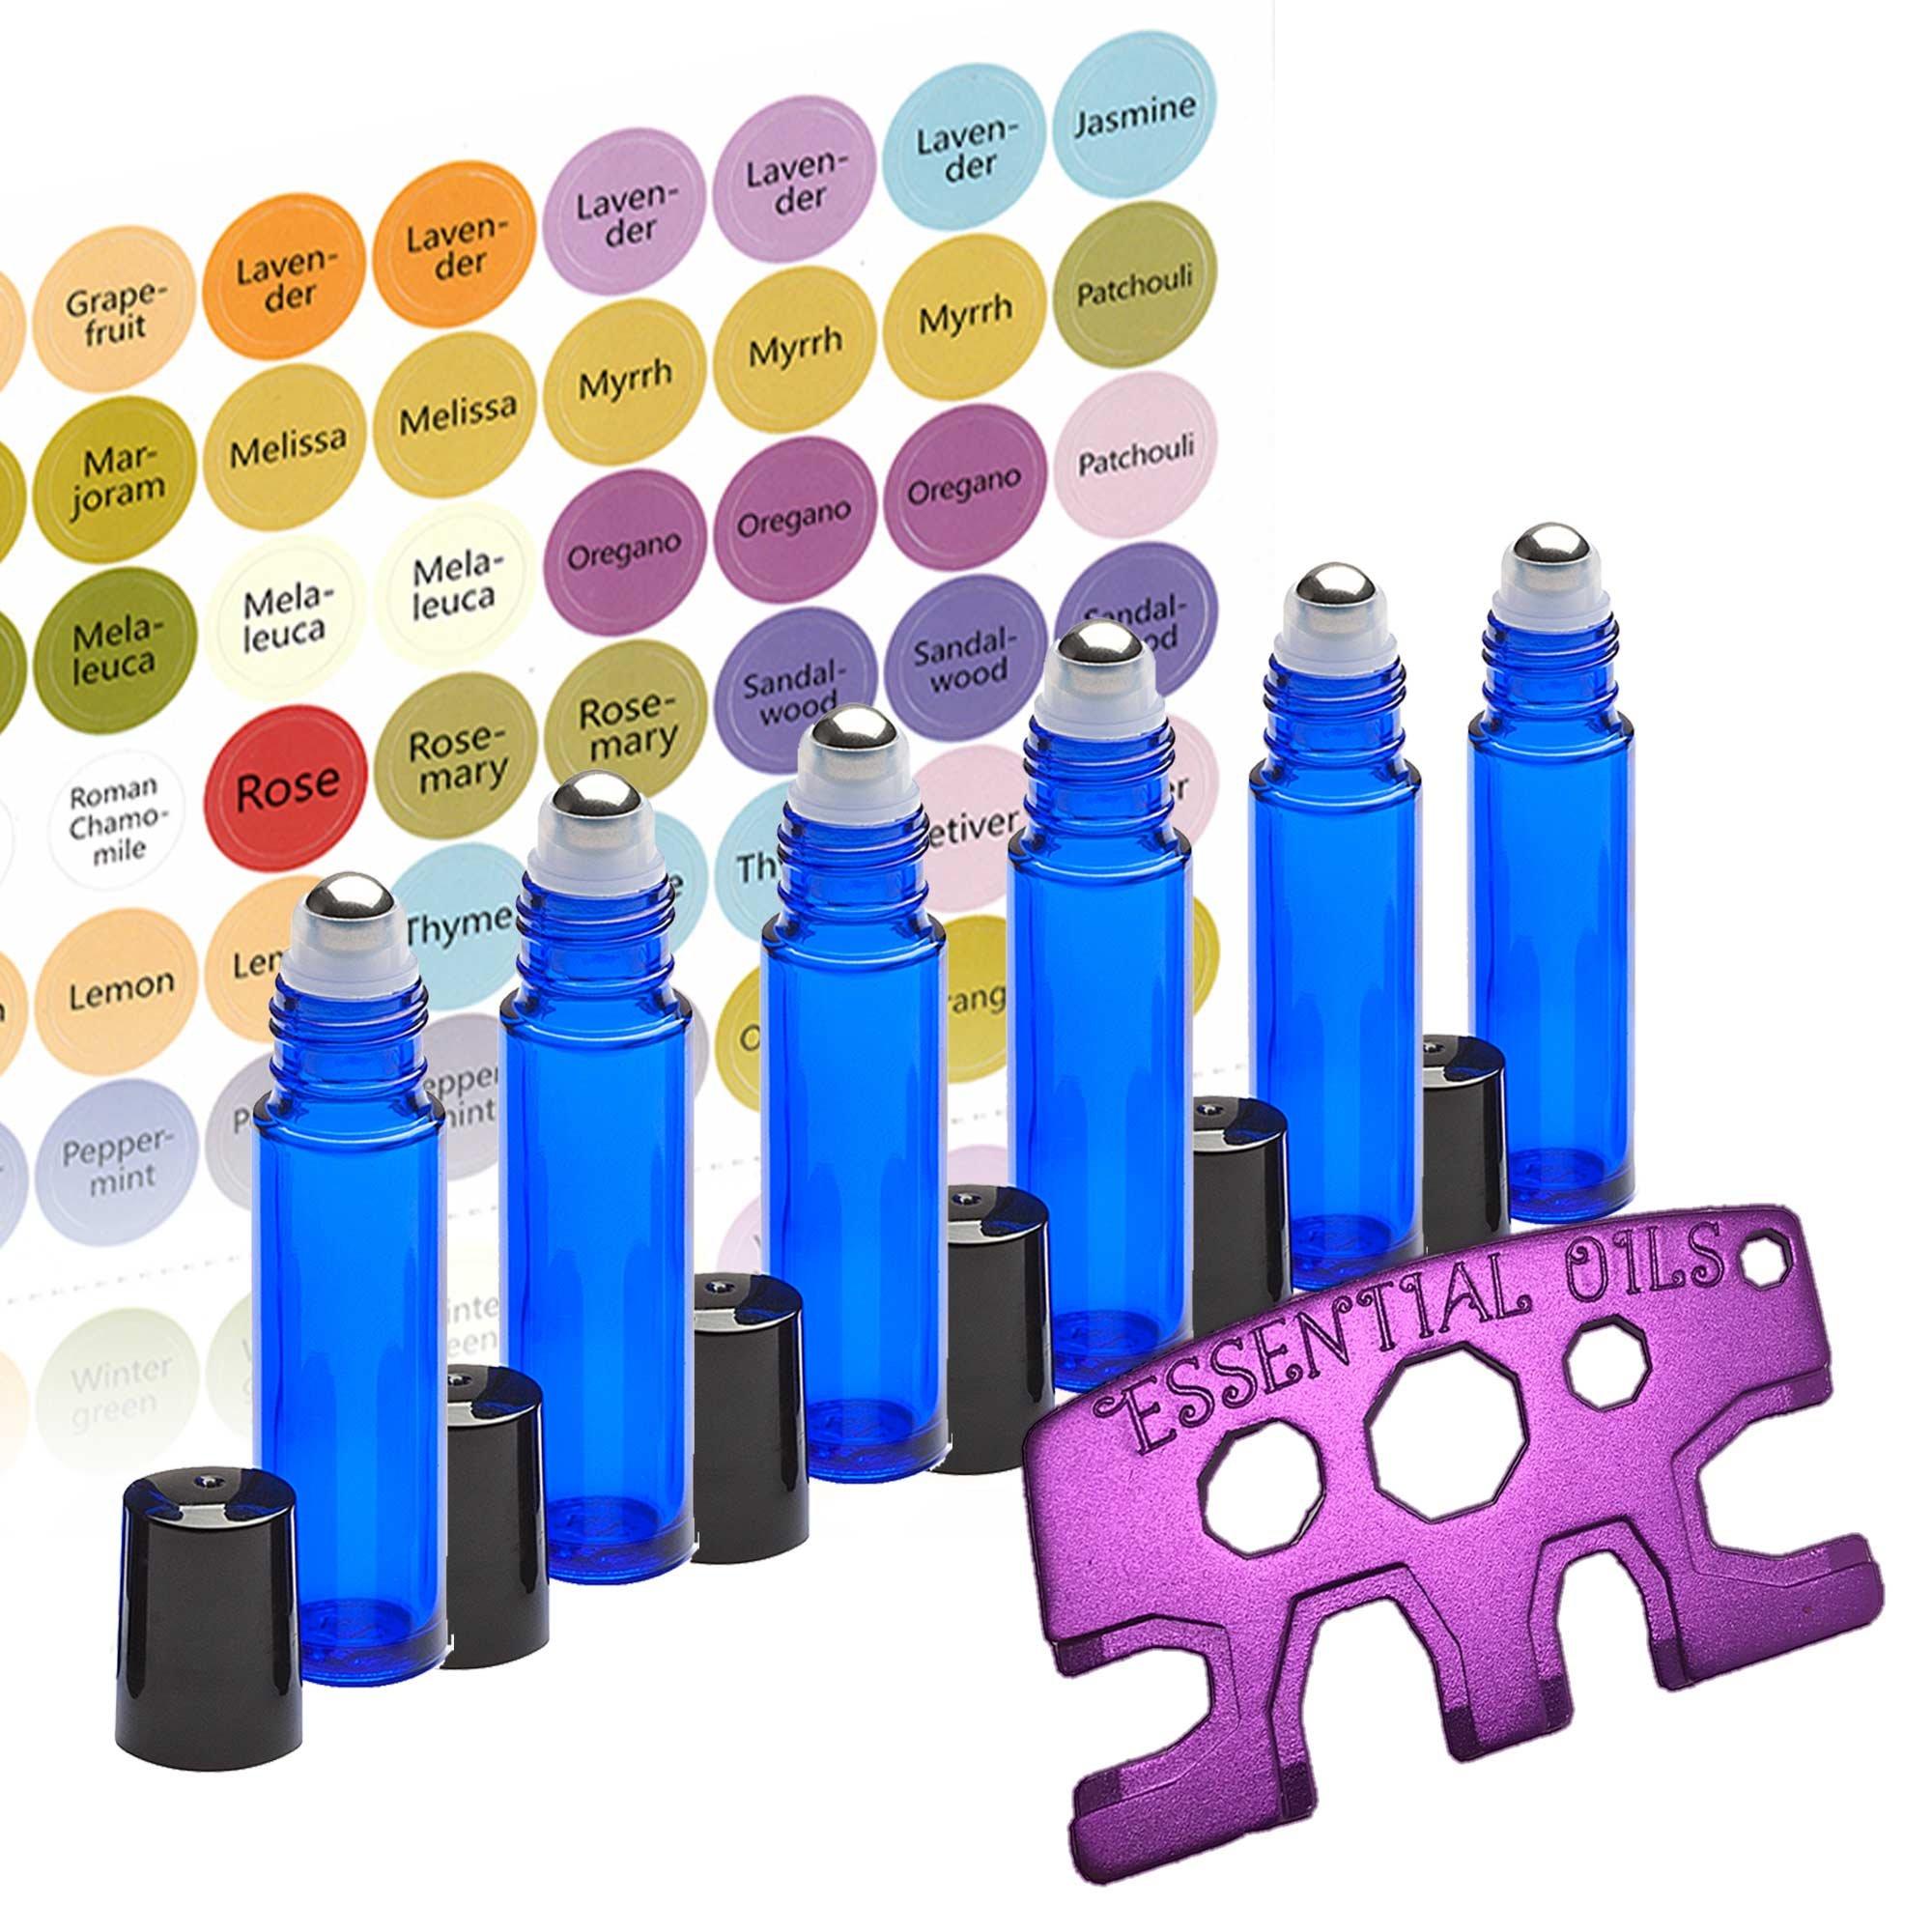 6 Glass Stainless Steel Roller Bottles - 6 Pack Cobalt Blue 10ml - Free Roller Bottle Opener Key Tool & 192 Essential Oil Bottle Cap Sticker Labels - Re-usable 10ml Roll ons